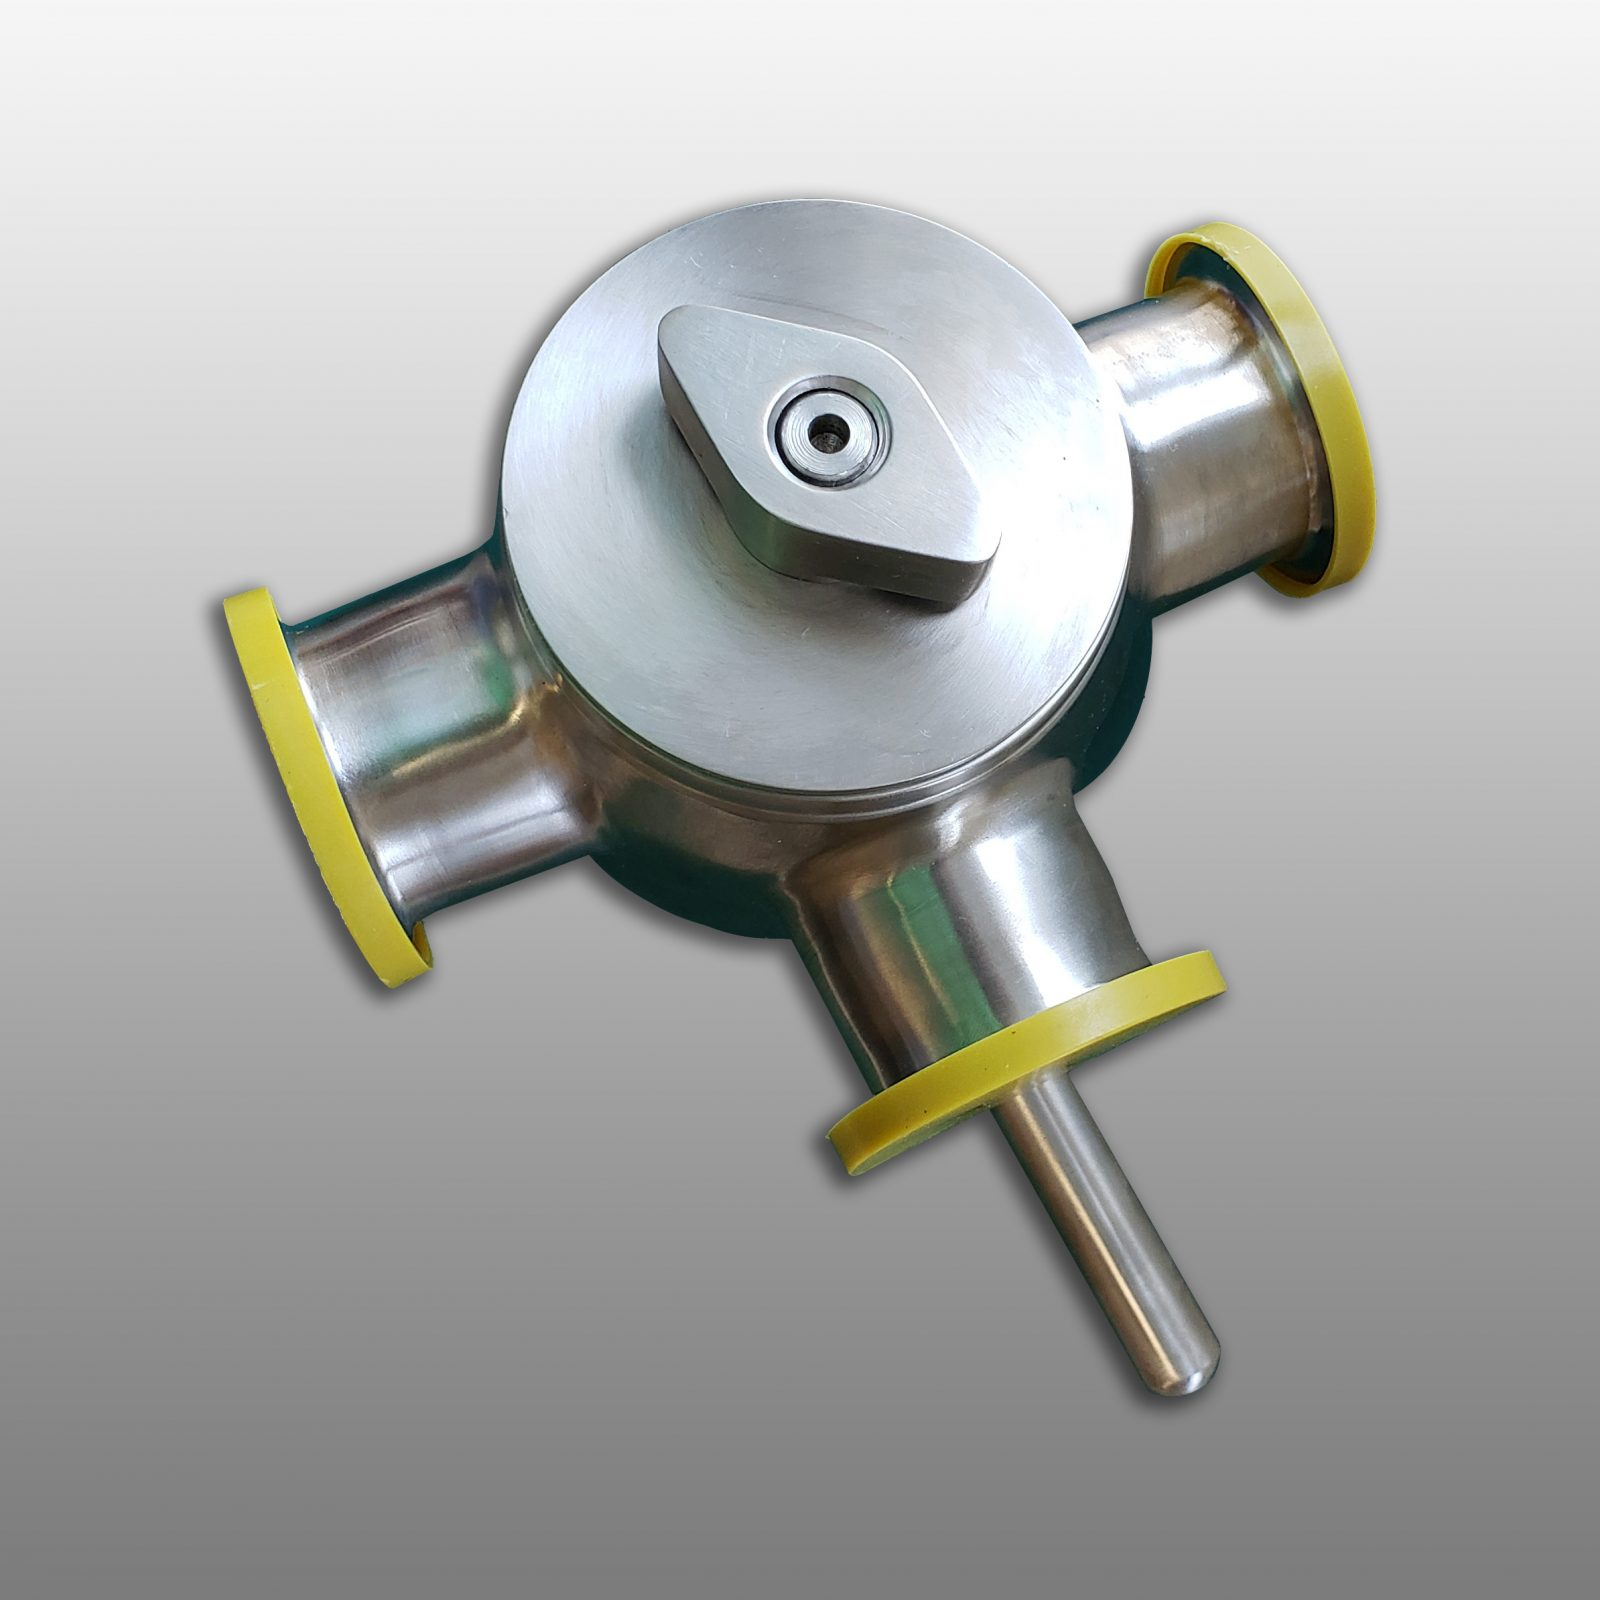 3 way plug valve